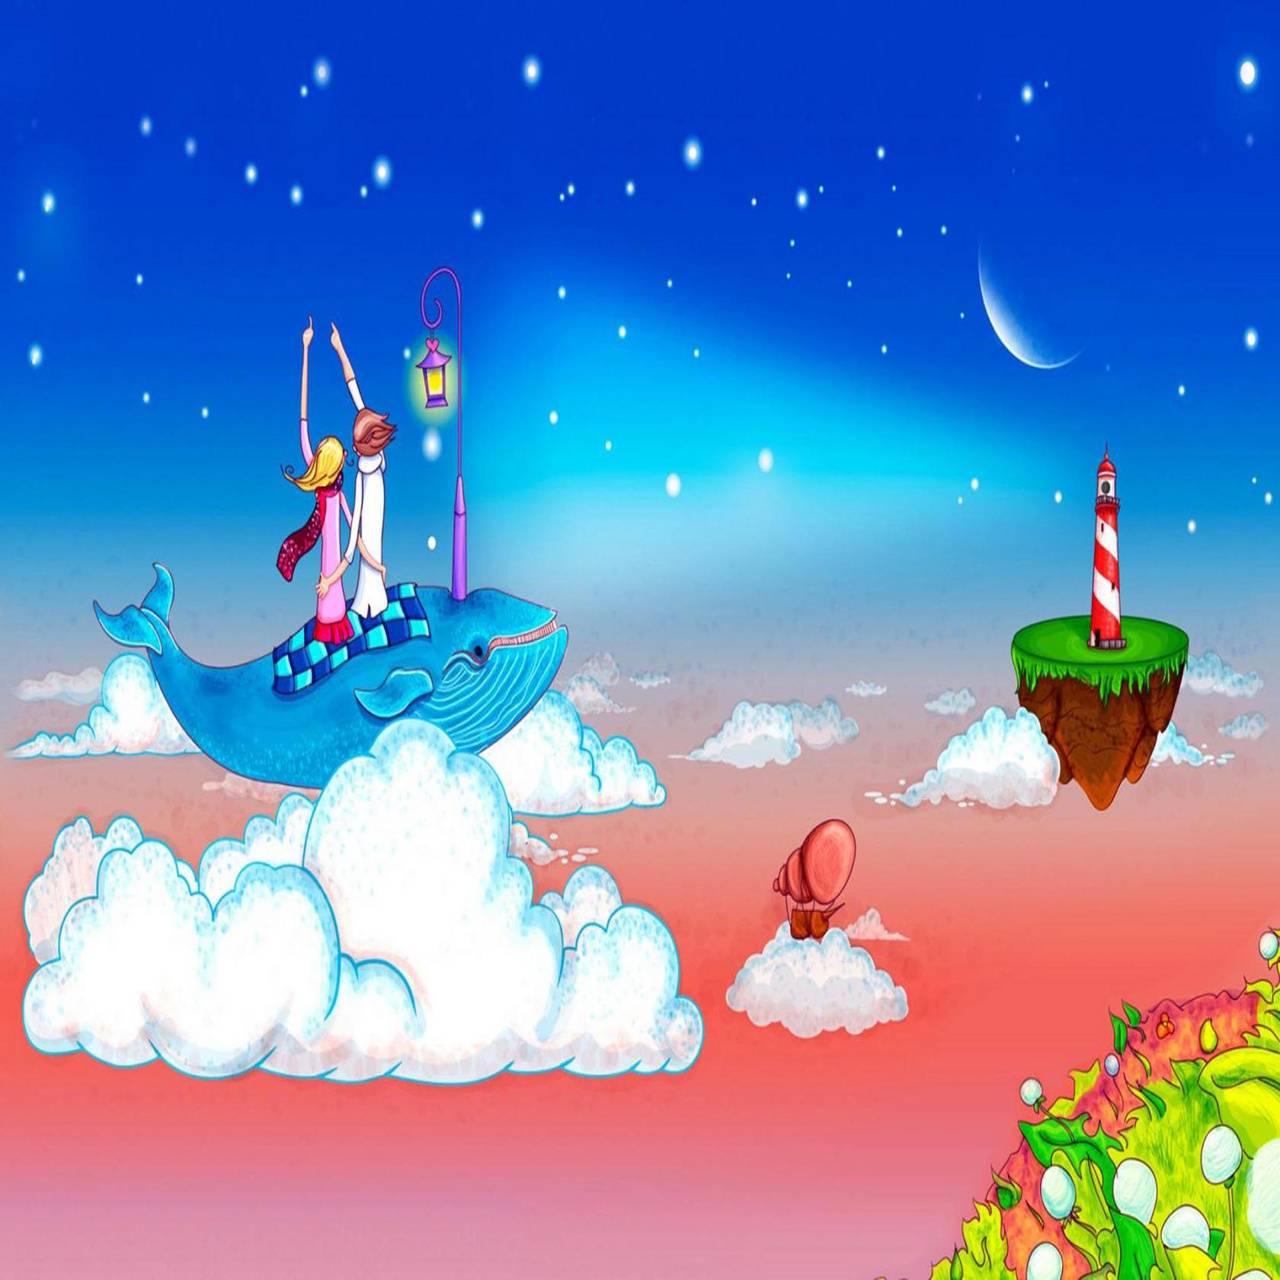 Dreamland animation